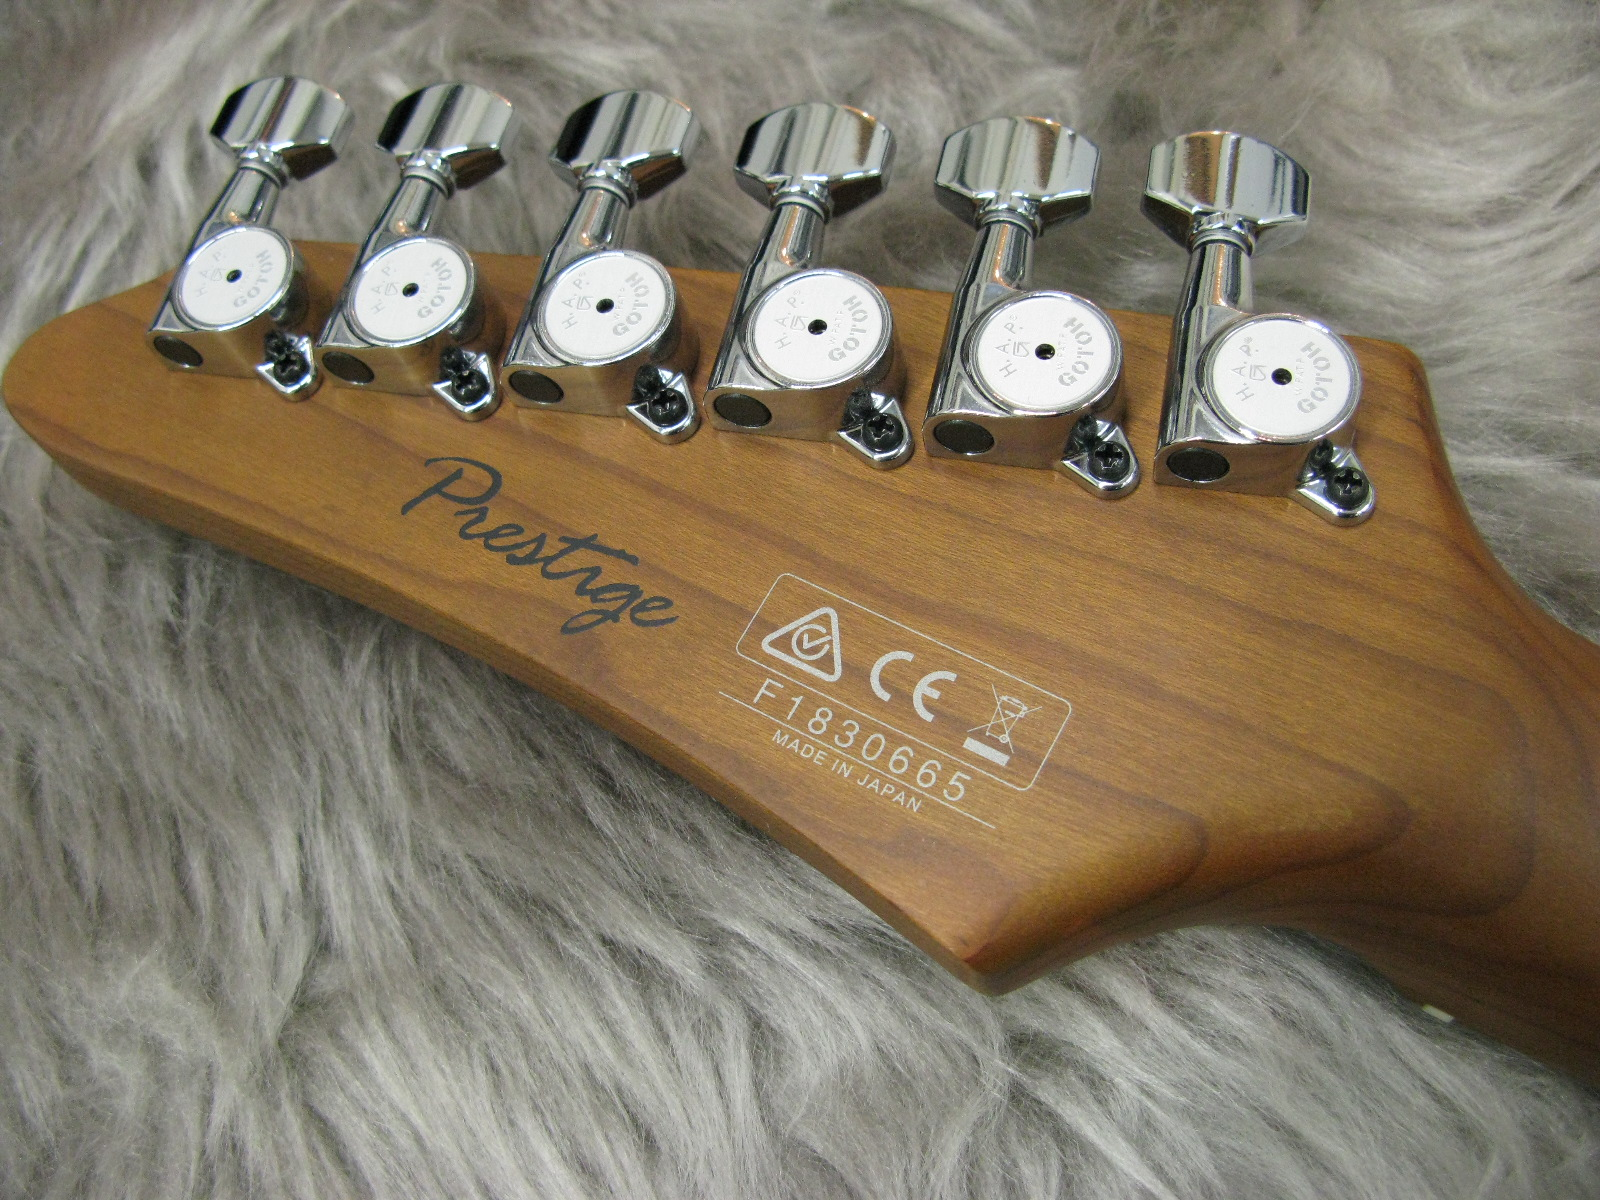 AZ2402のヘッド裏-アップ画像